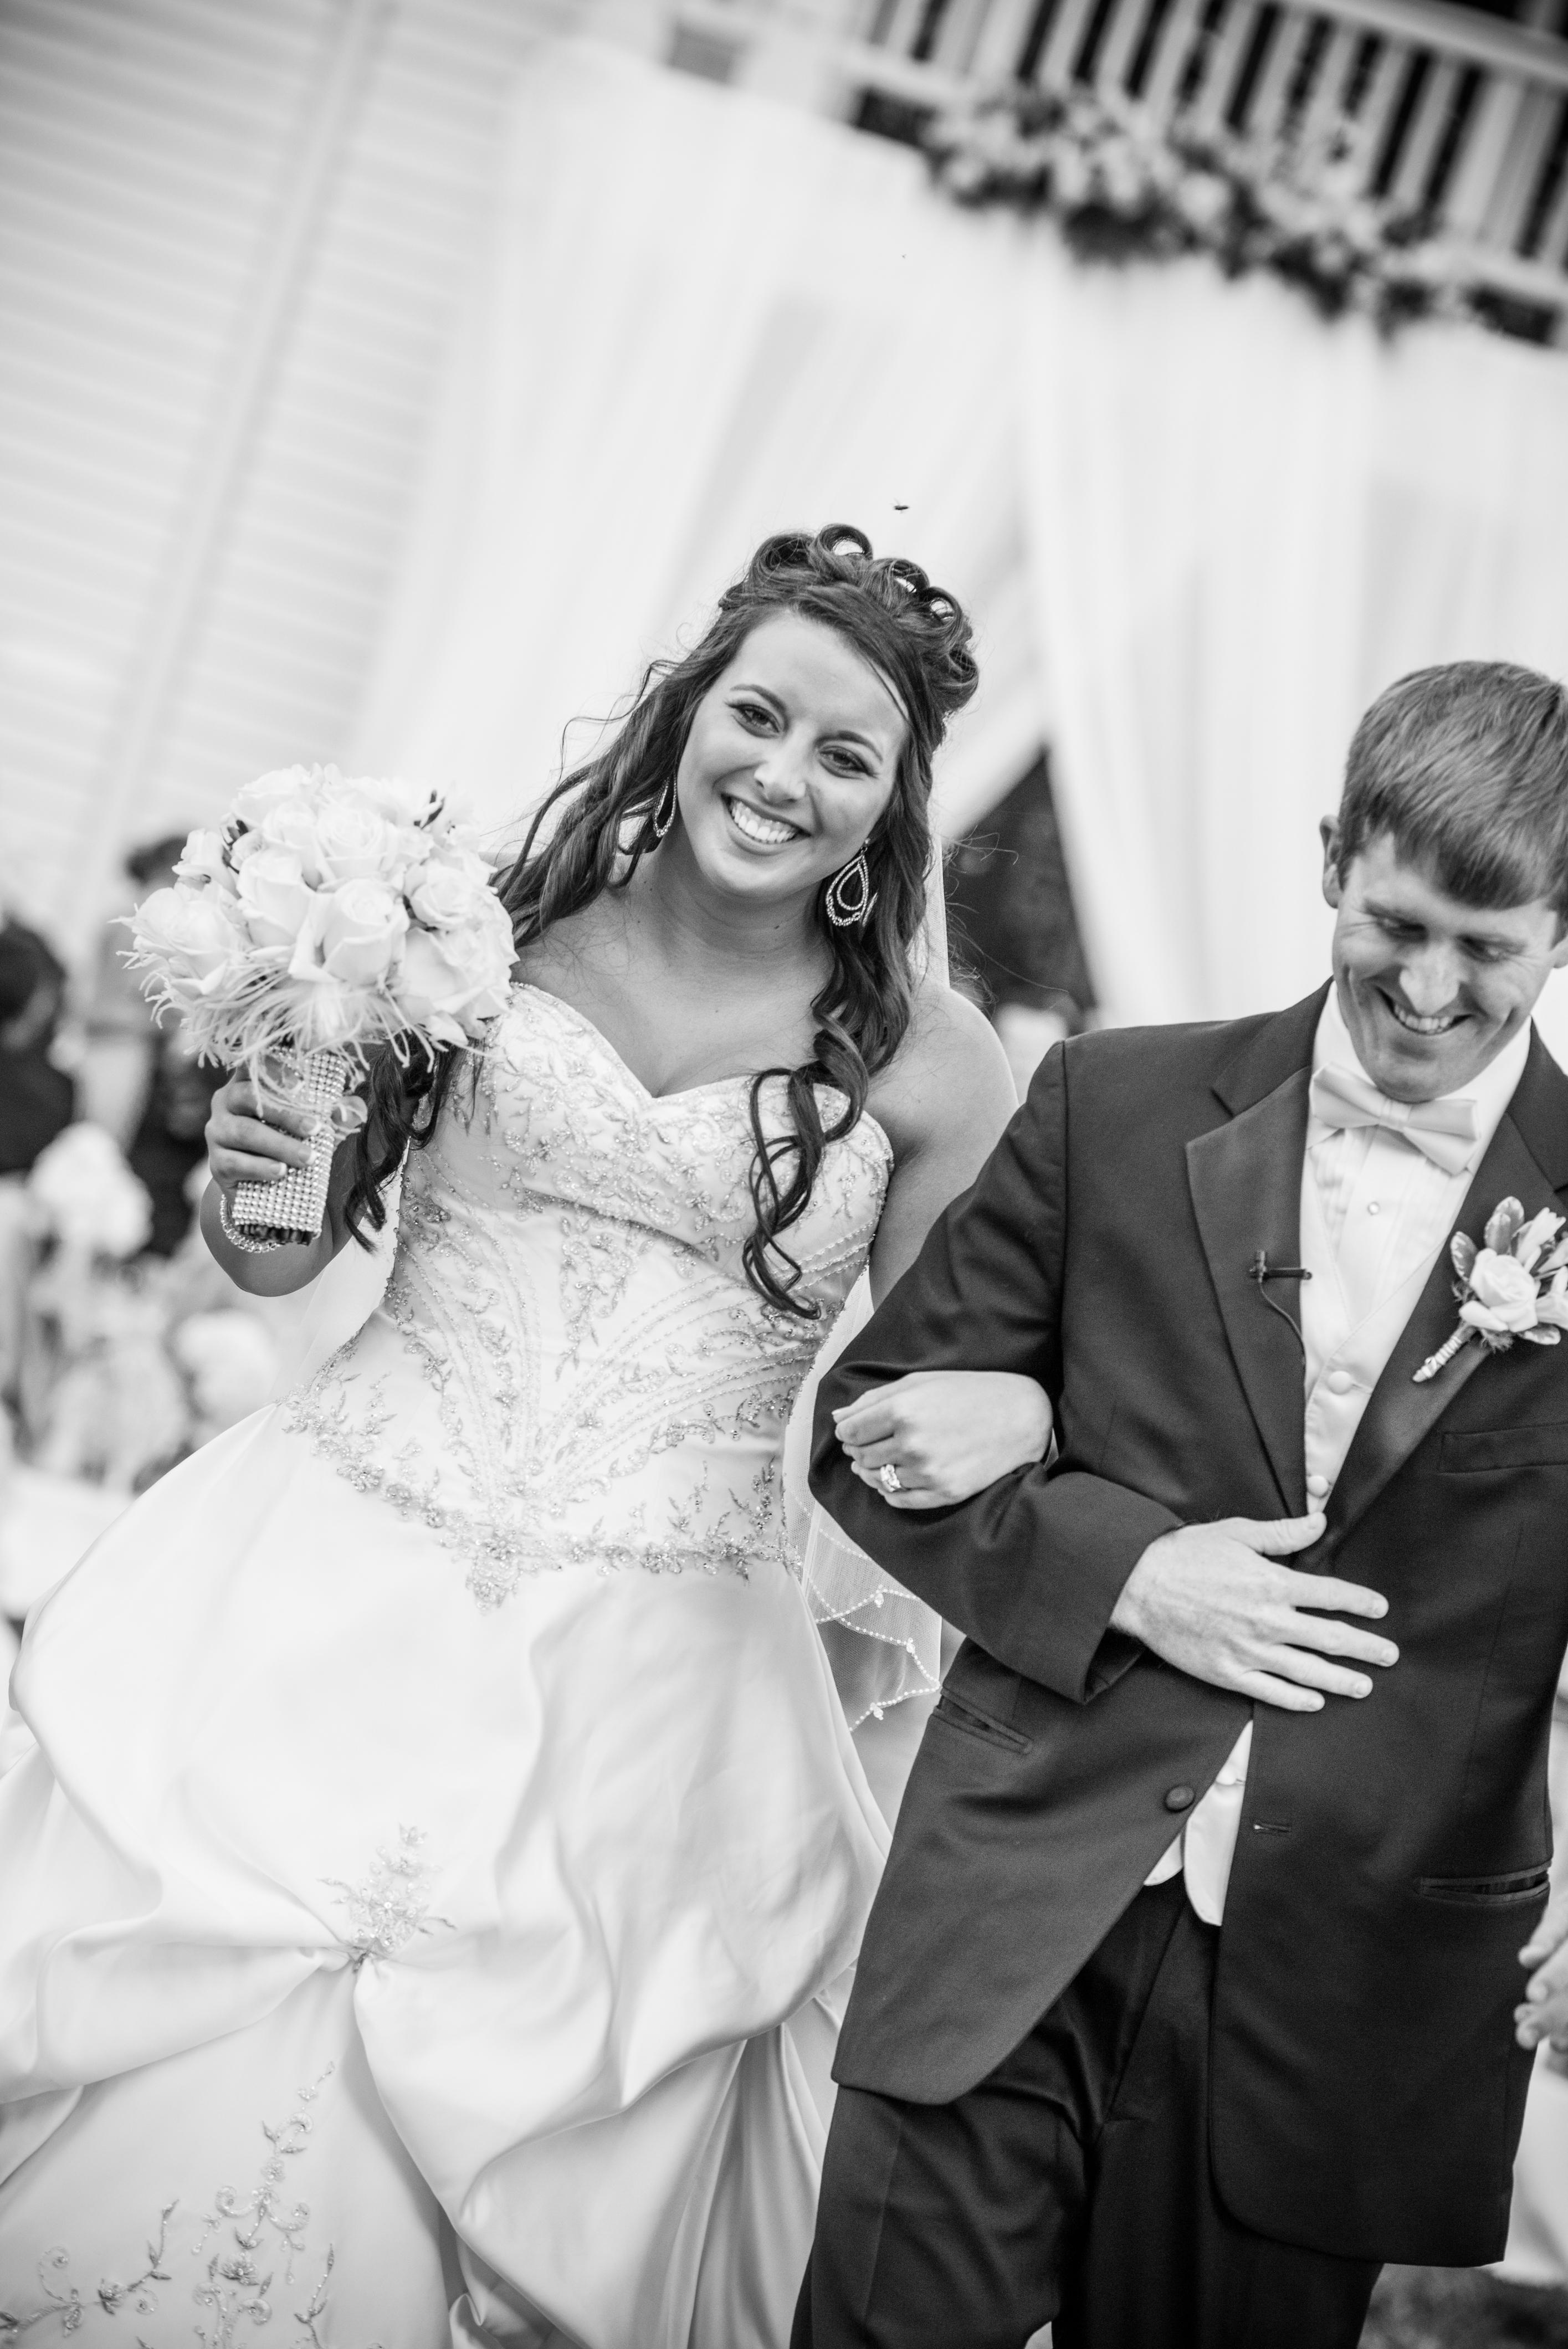 Matt-Blakely-wedding-nashville-tn-legacy-farms-940